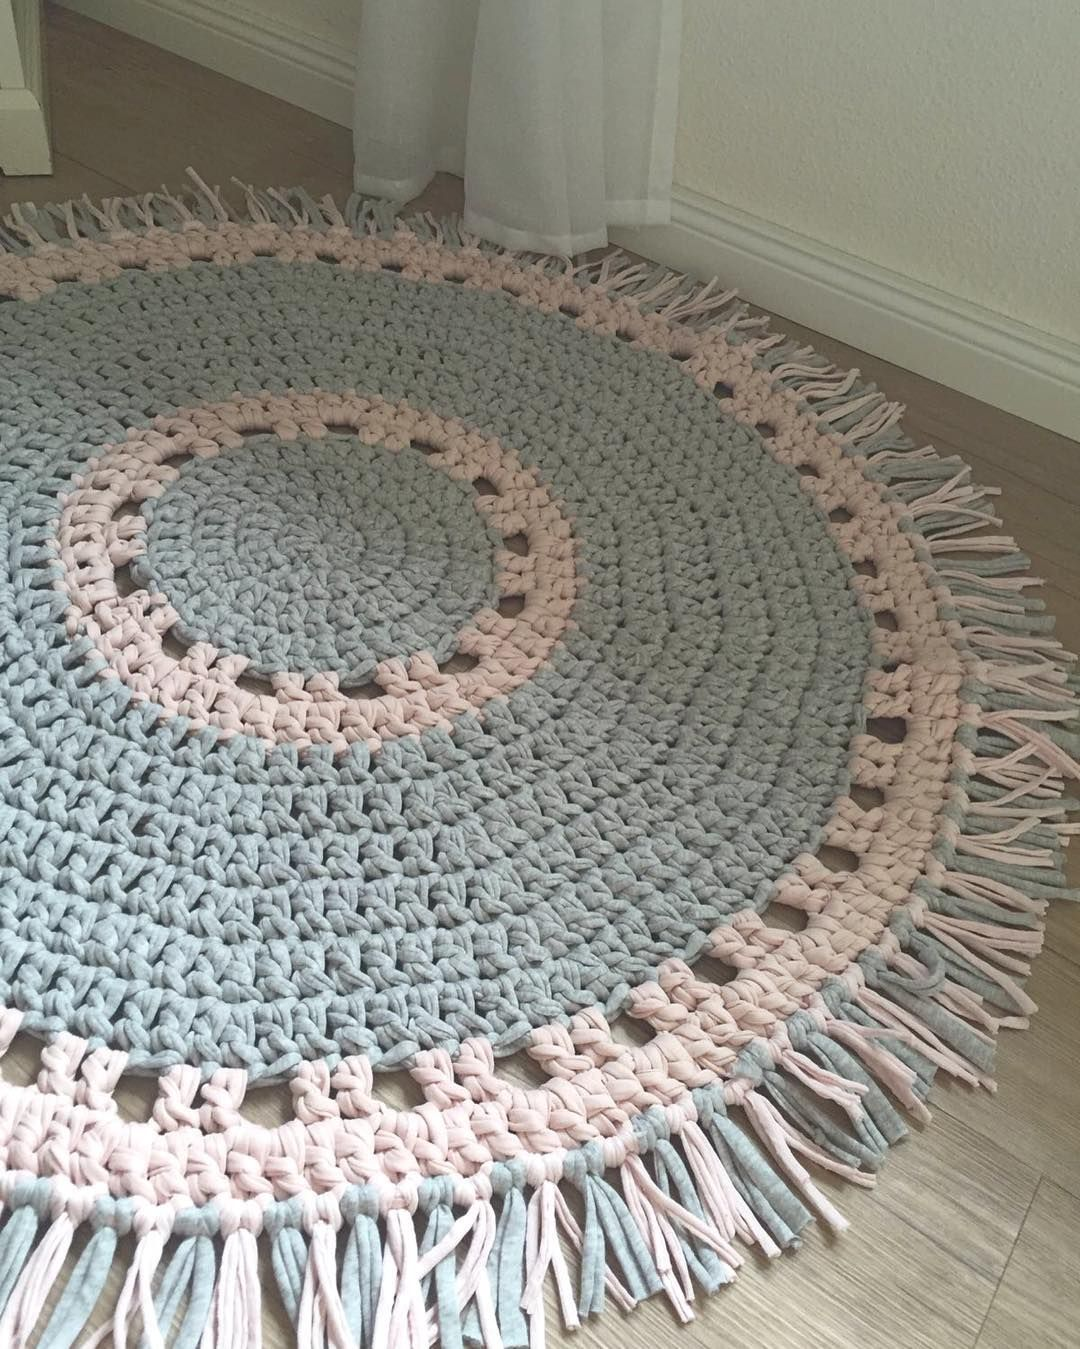 Lovely Fransenteppich grau rosa m crochetrug h keln crochet h kelnisttoll shareyourhoooked